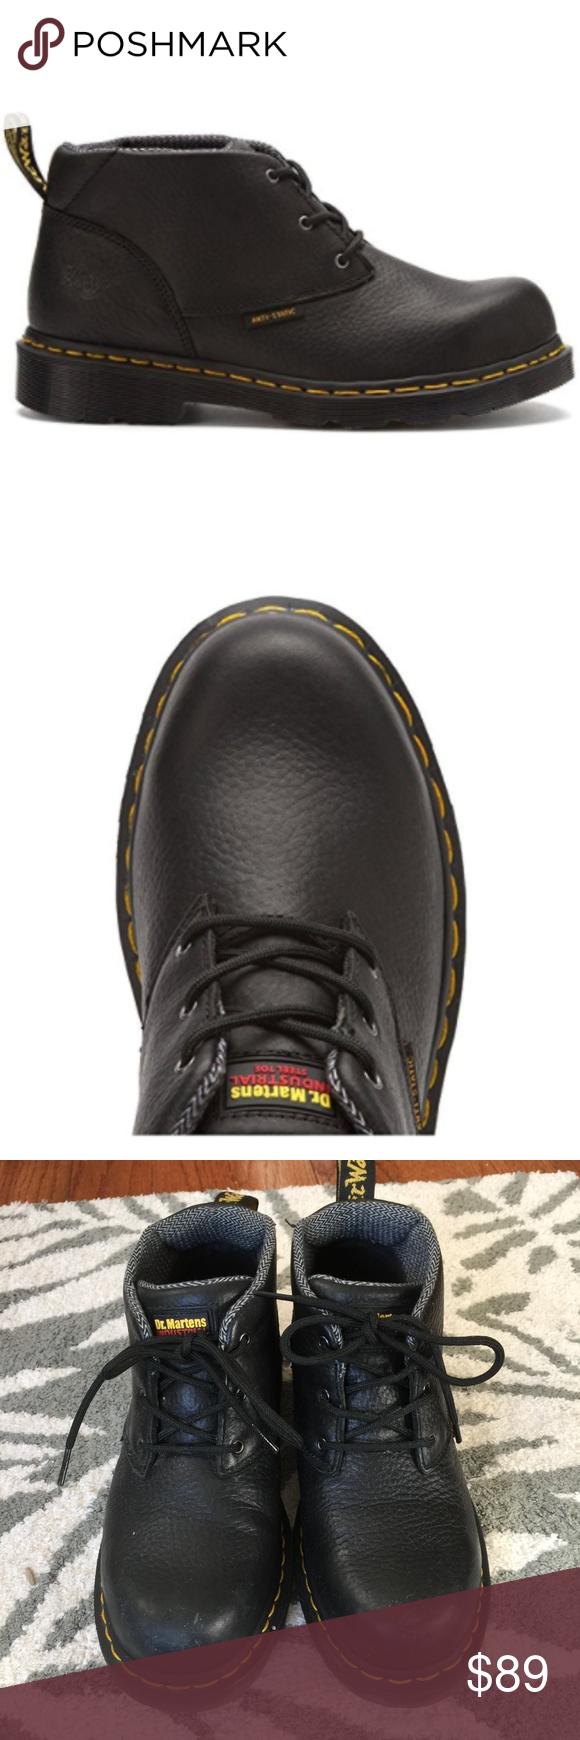 Dr. Martens// Women's Izzi Safety Toe Boots Size 6 UK / 8